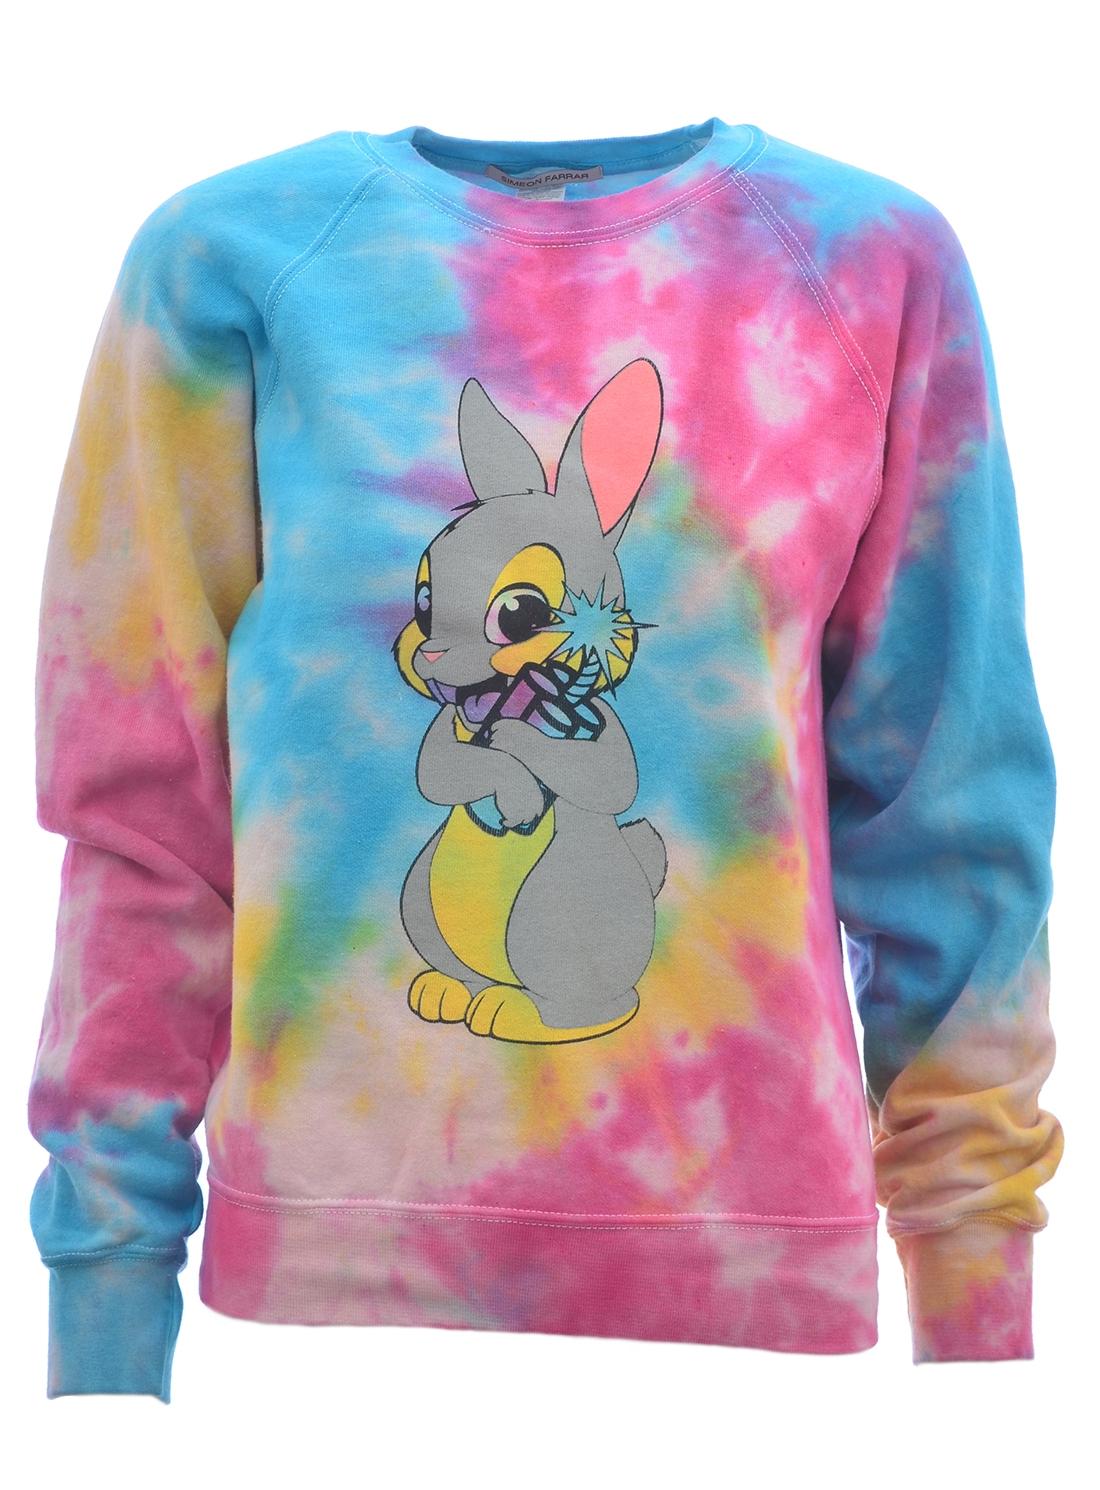 SWEATSHIRT. Multi Colour Bunny Tie Dye by Simeon Farrar